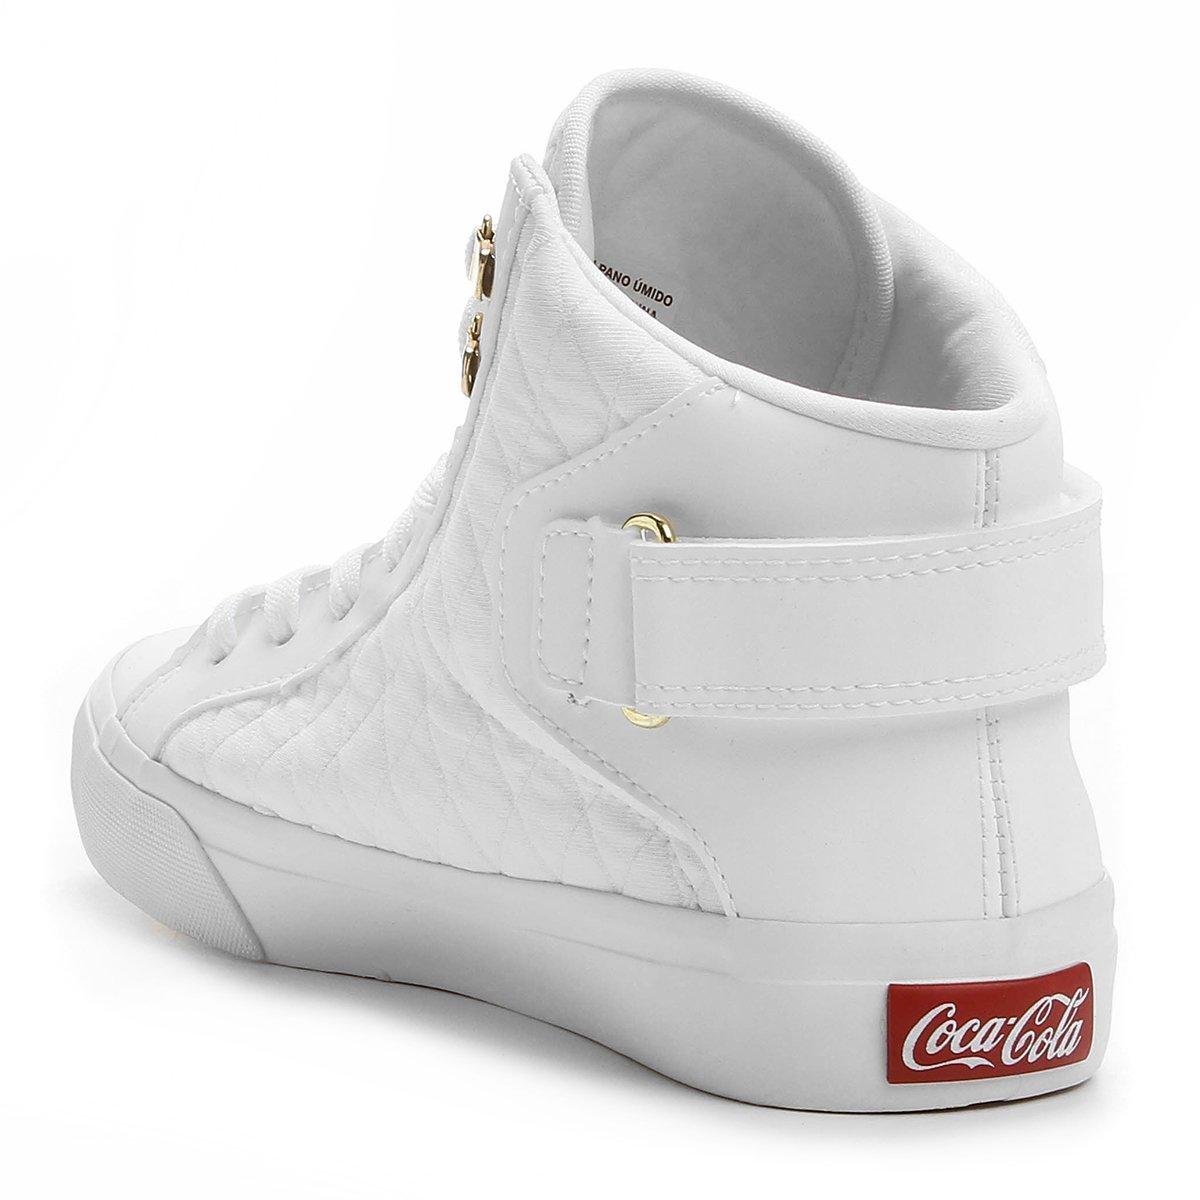 Envy Tênis Envy Cola Coca Branco Tênis Branco Cola Coca wqCItC4xz